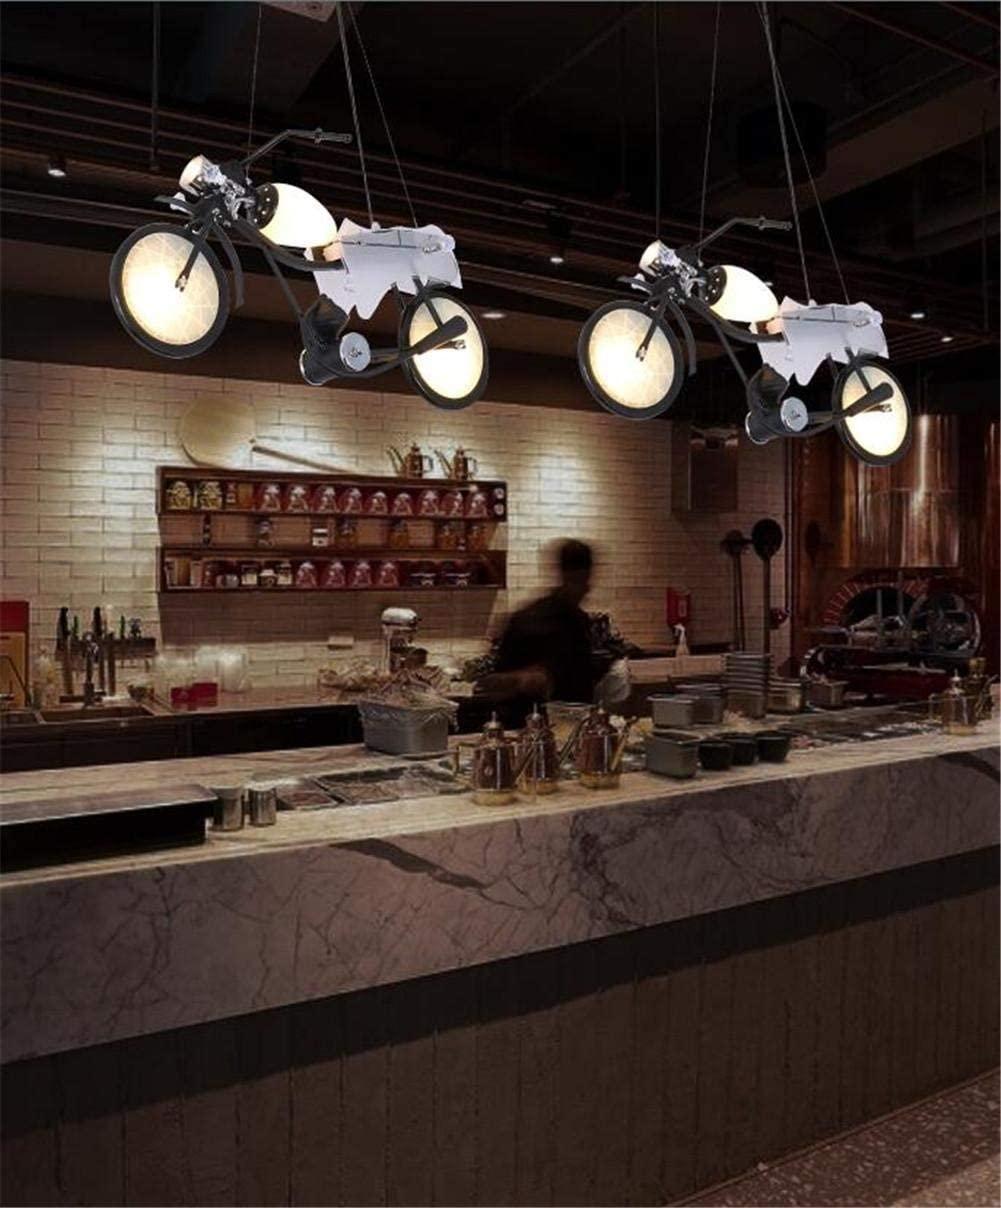 Pendant Lamp Retro Chandelier Loft Industrial Vintage Nostalgic Decoration Wrought Iron Pendant Ceiling Lamp for Living Room Bar Cafe Restaurant